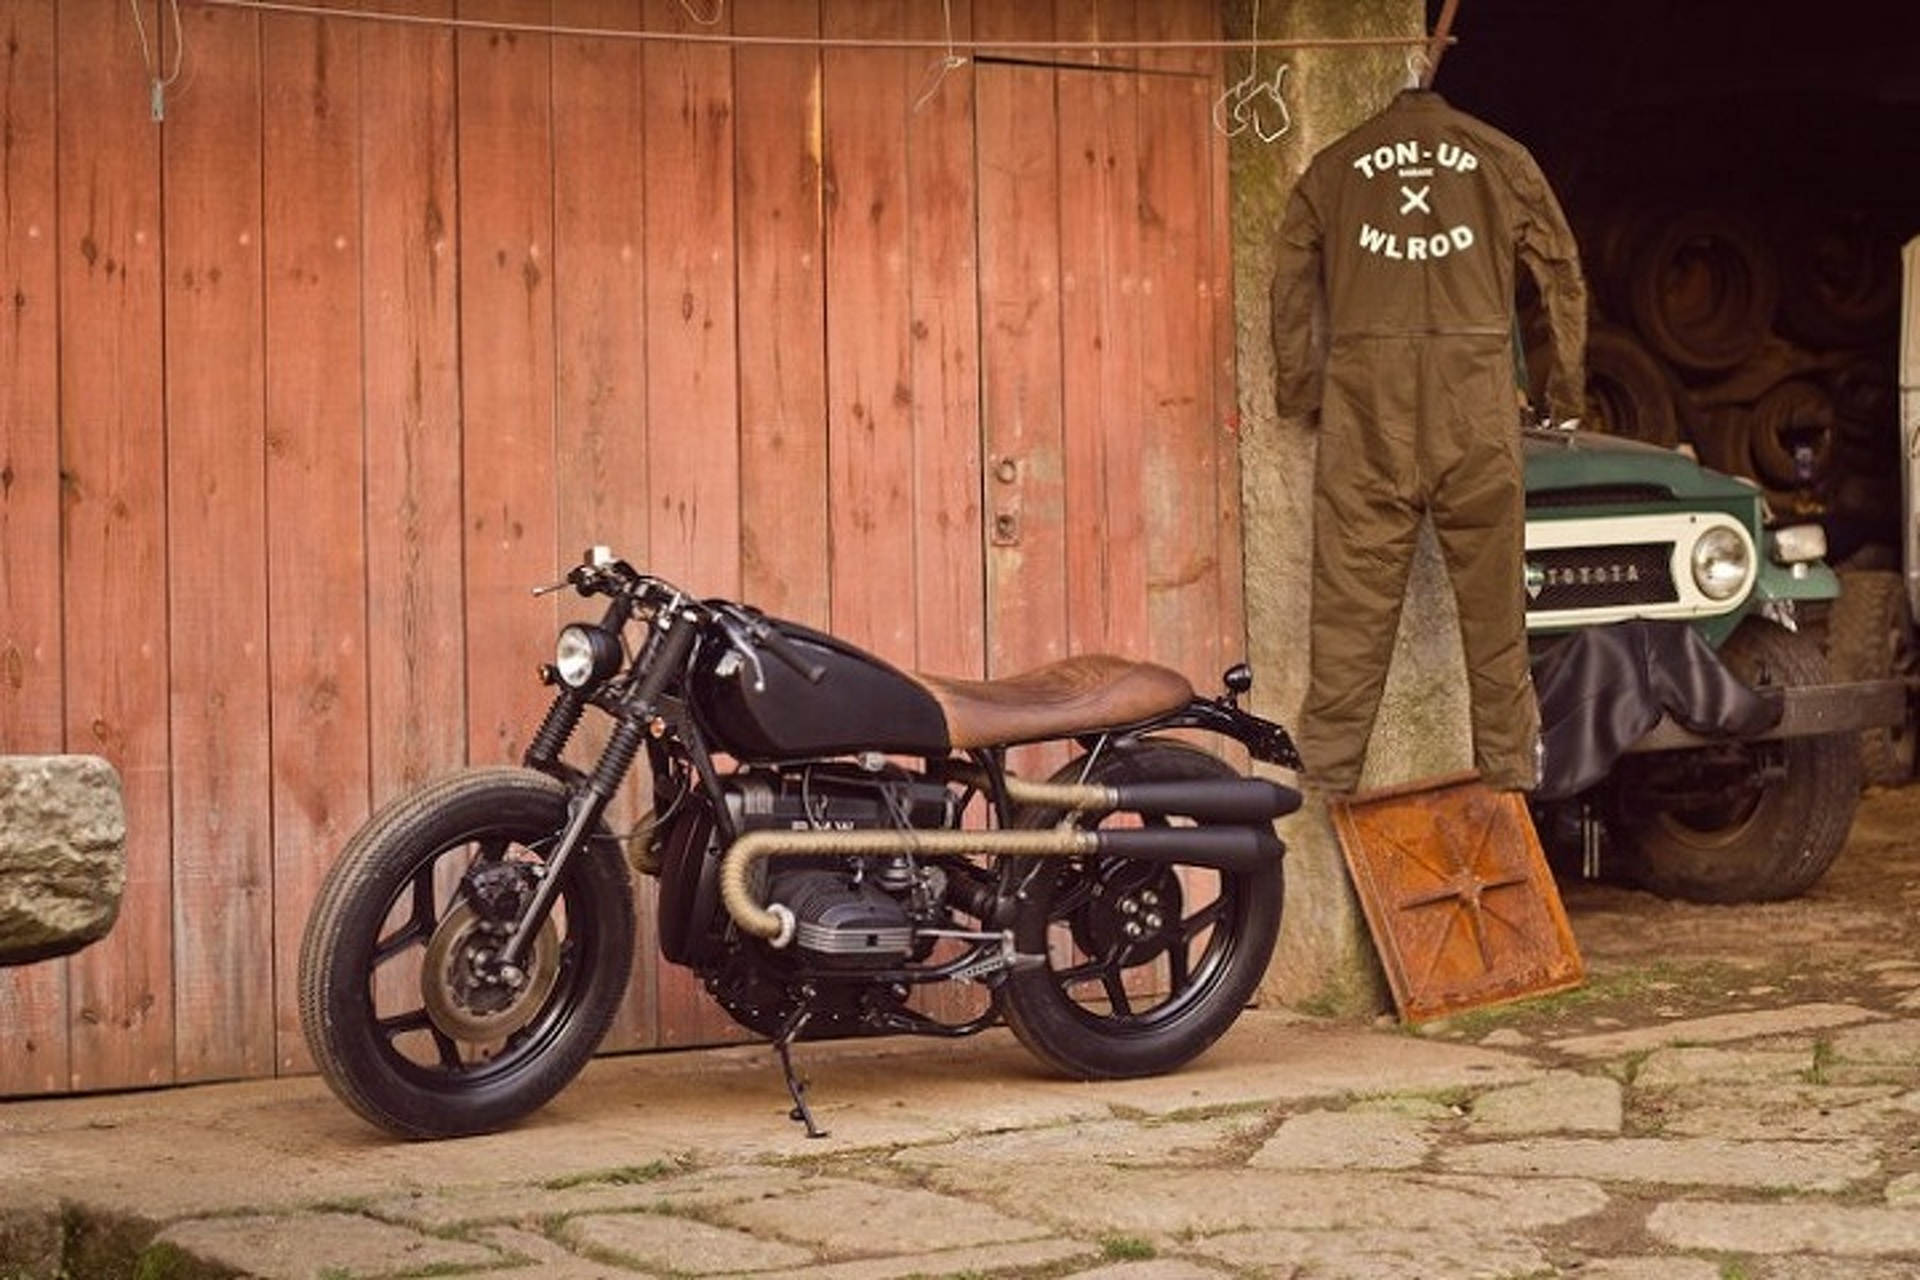 Ton up Garage Sets the Bar for the Café Racer